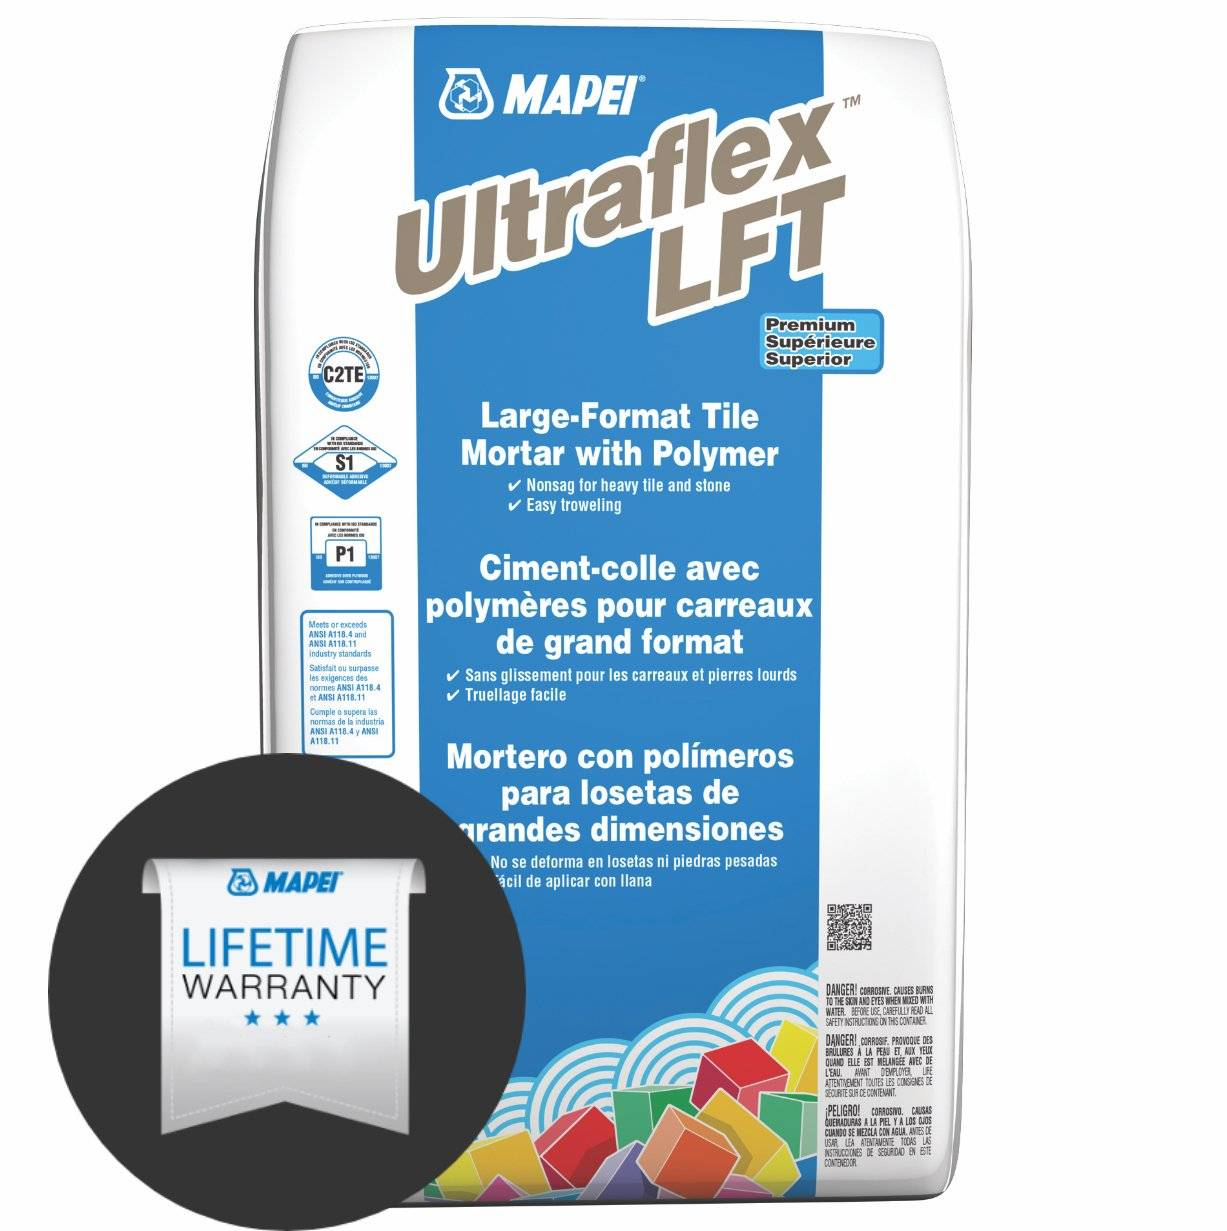 Mapei Ultraflex LFT White - Large Format Tile Mortar